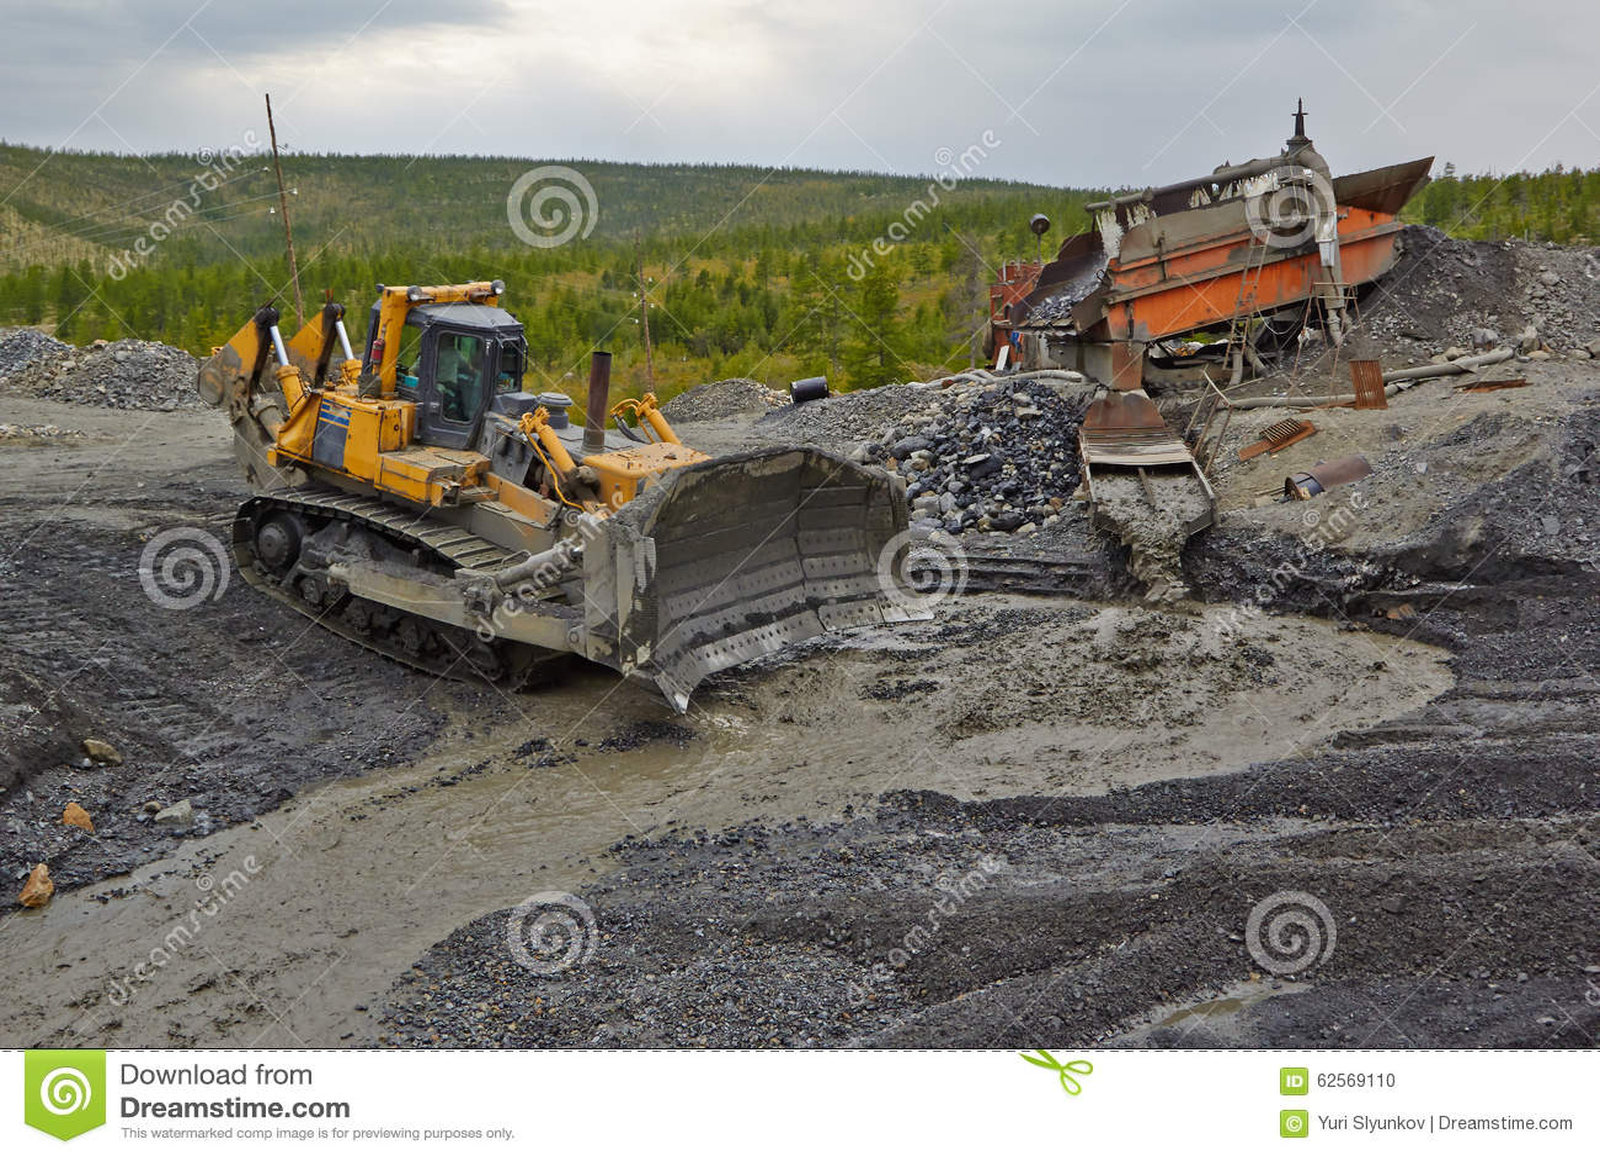 Gold mining in Susuman. The bulldozer and derocker